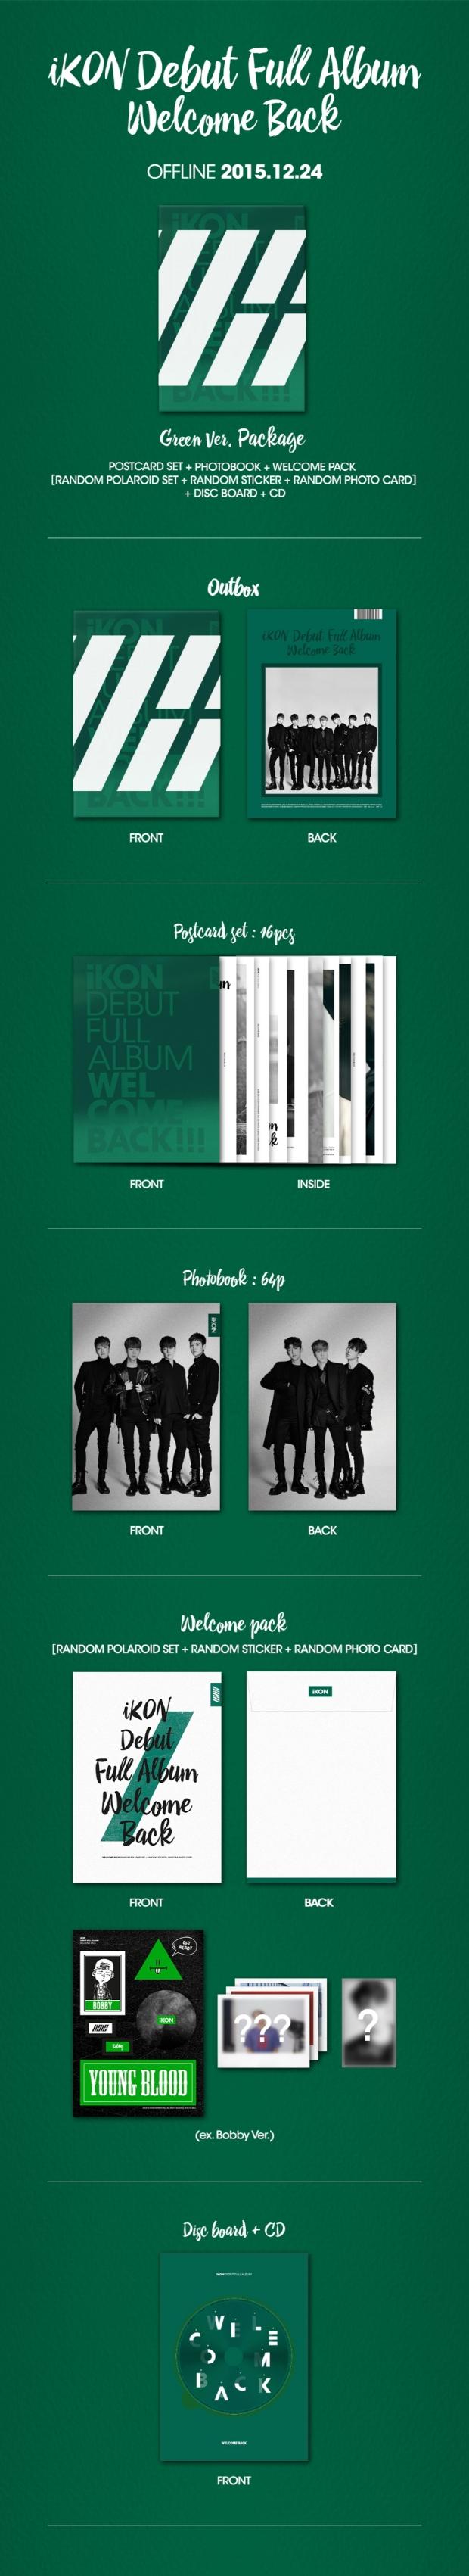 ikon_full_album_green_03